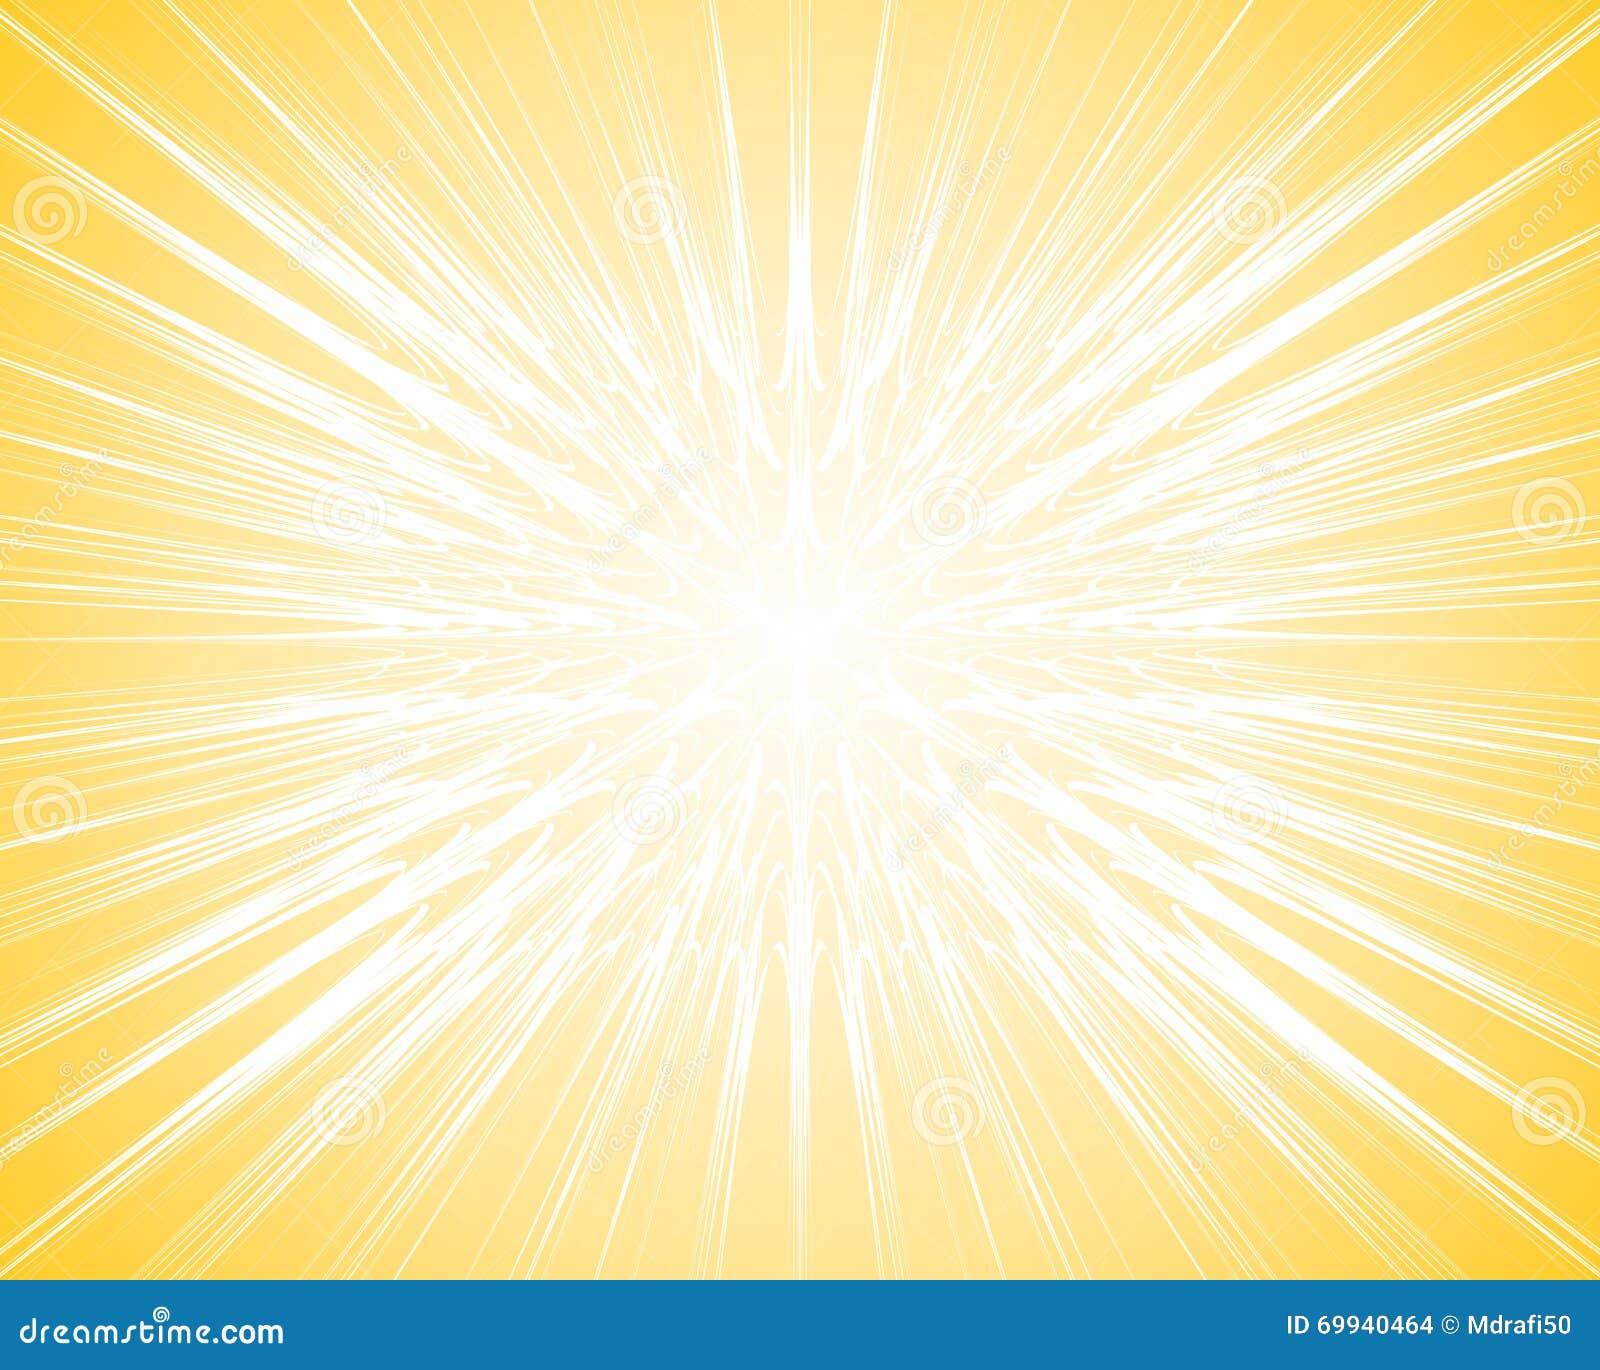 Yellow Light Ray Burst Background Stock Vector - Illustration of ... for Yellow Light Rays Background  110zmd